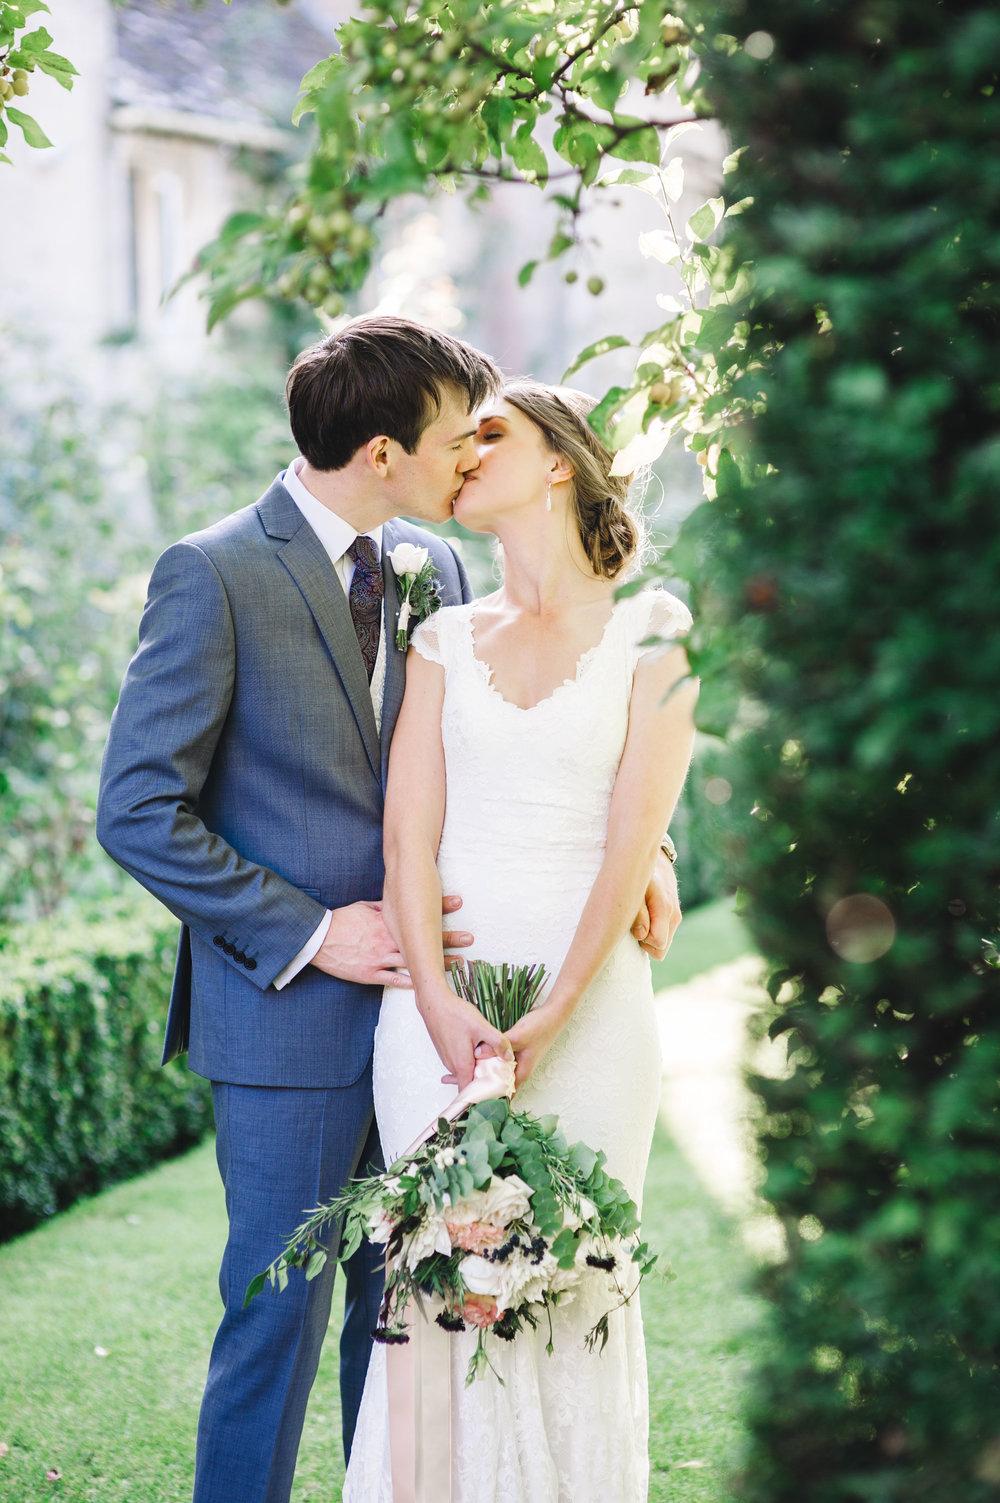 WIltshire weddings - Rachel and Chris (172 of 175).jpg